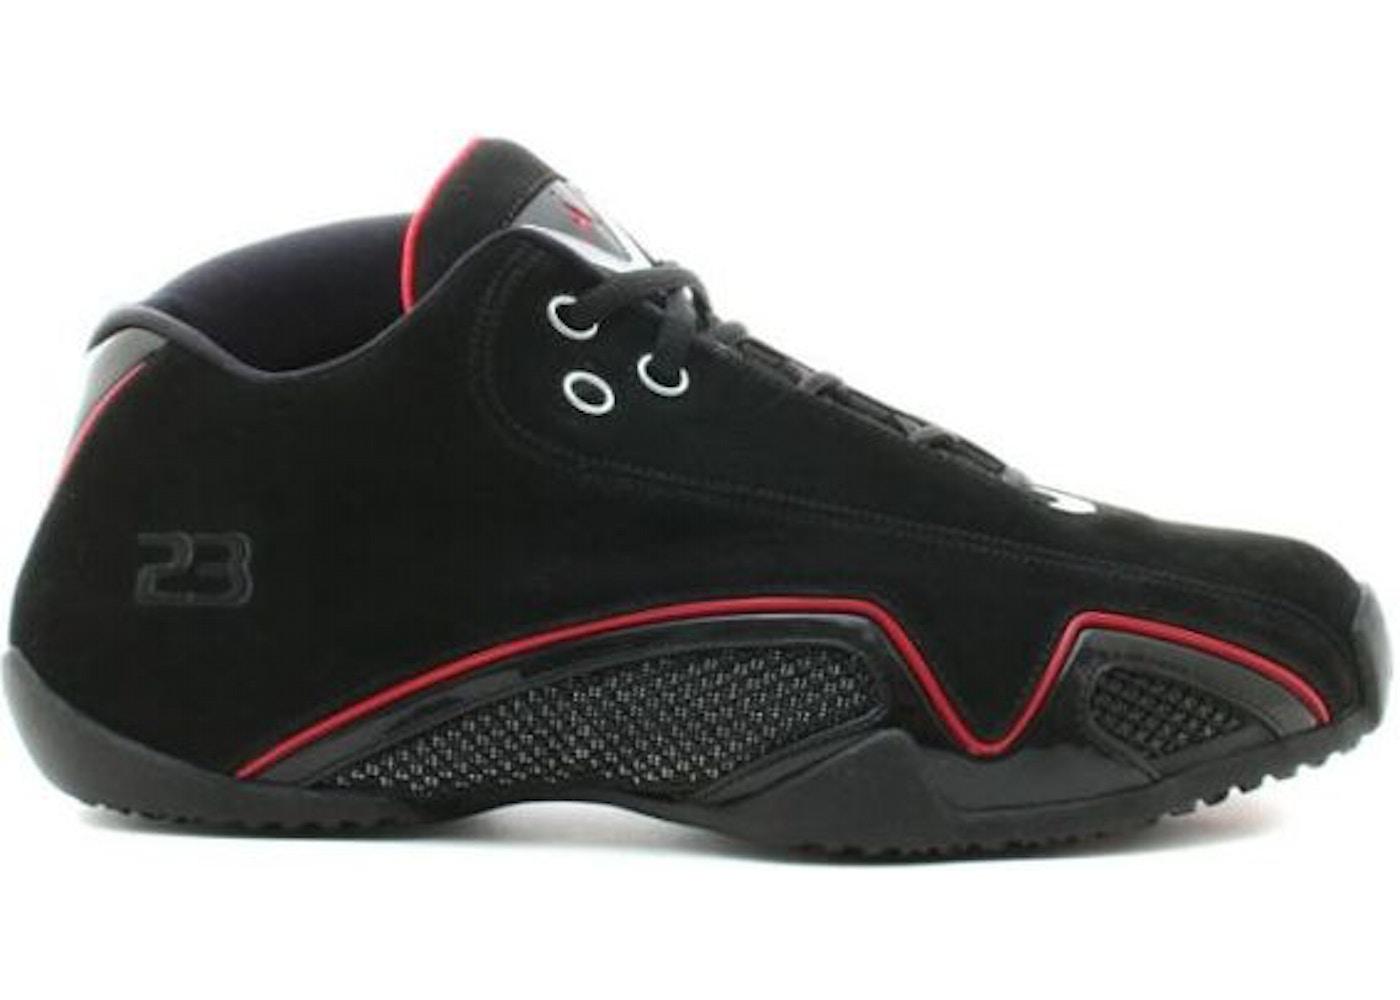 4d66a404de8 Jordan 21 OG Low Bred - 313529-002